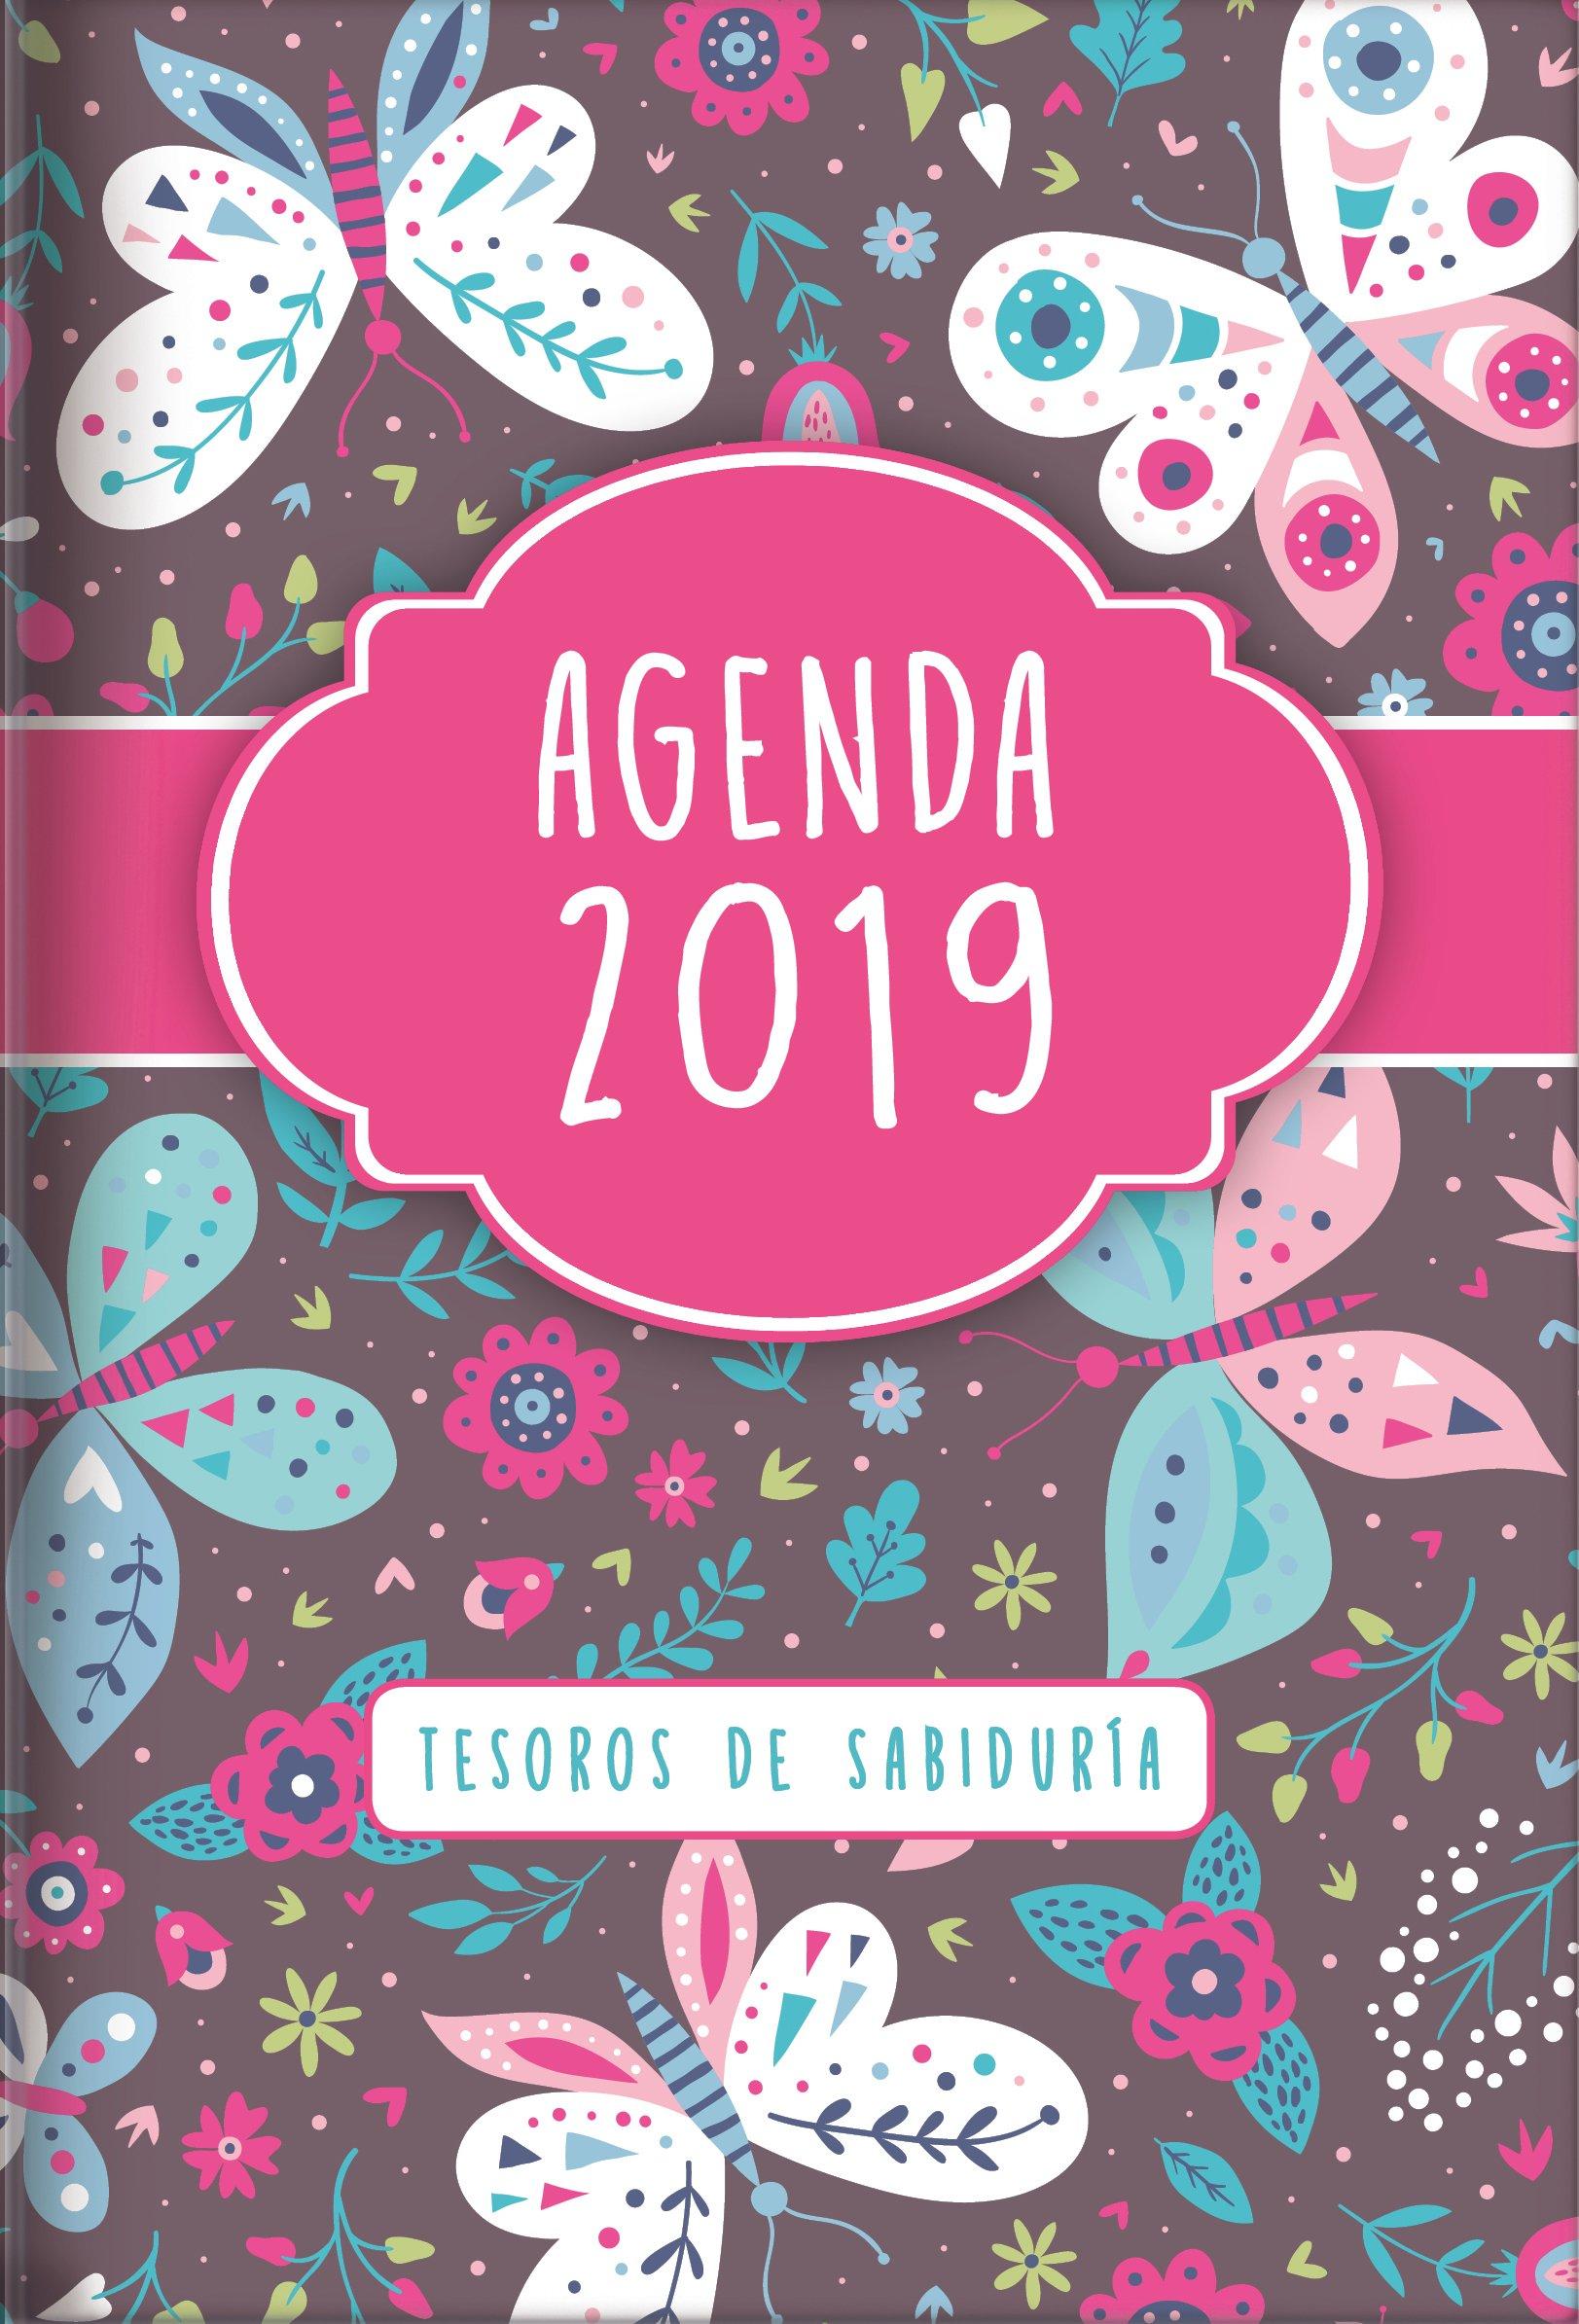 Amazon.com: 2019 Agenda - Tesoros de Sabiduría - Mariposas ...